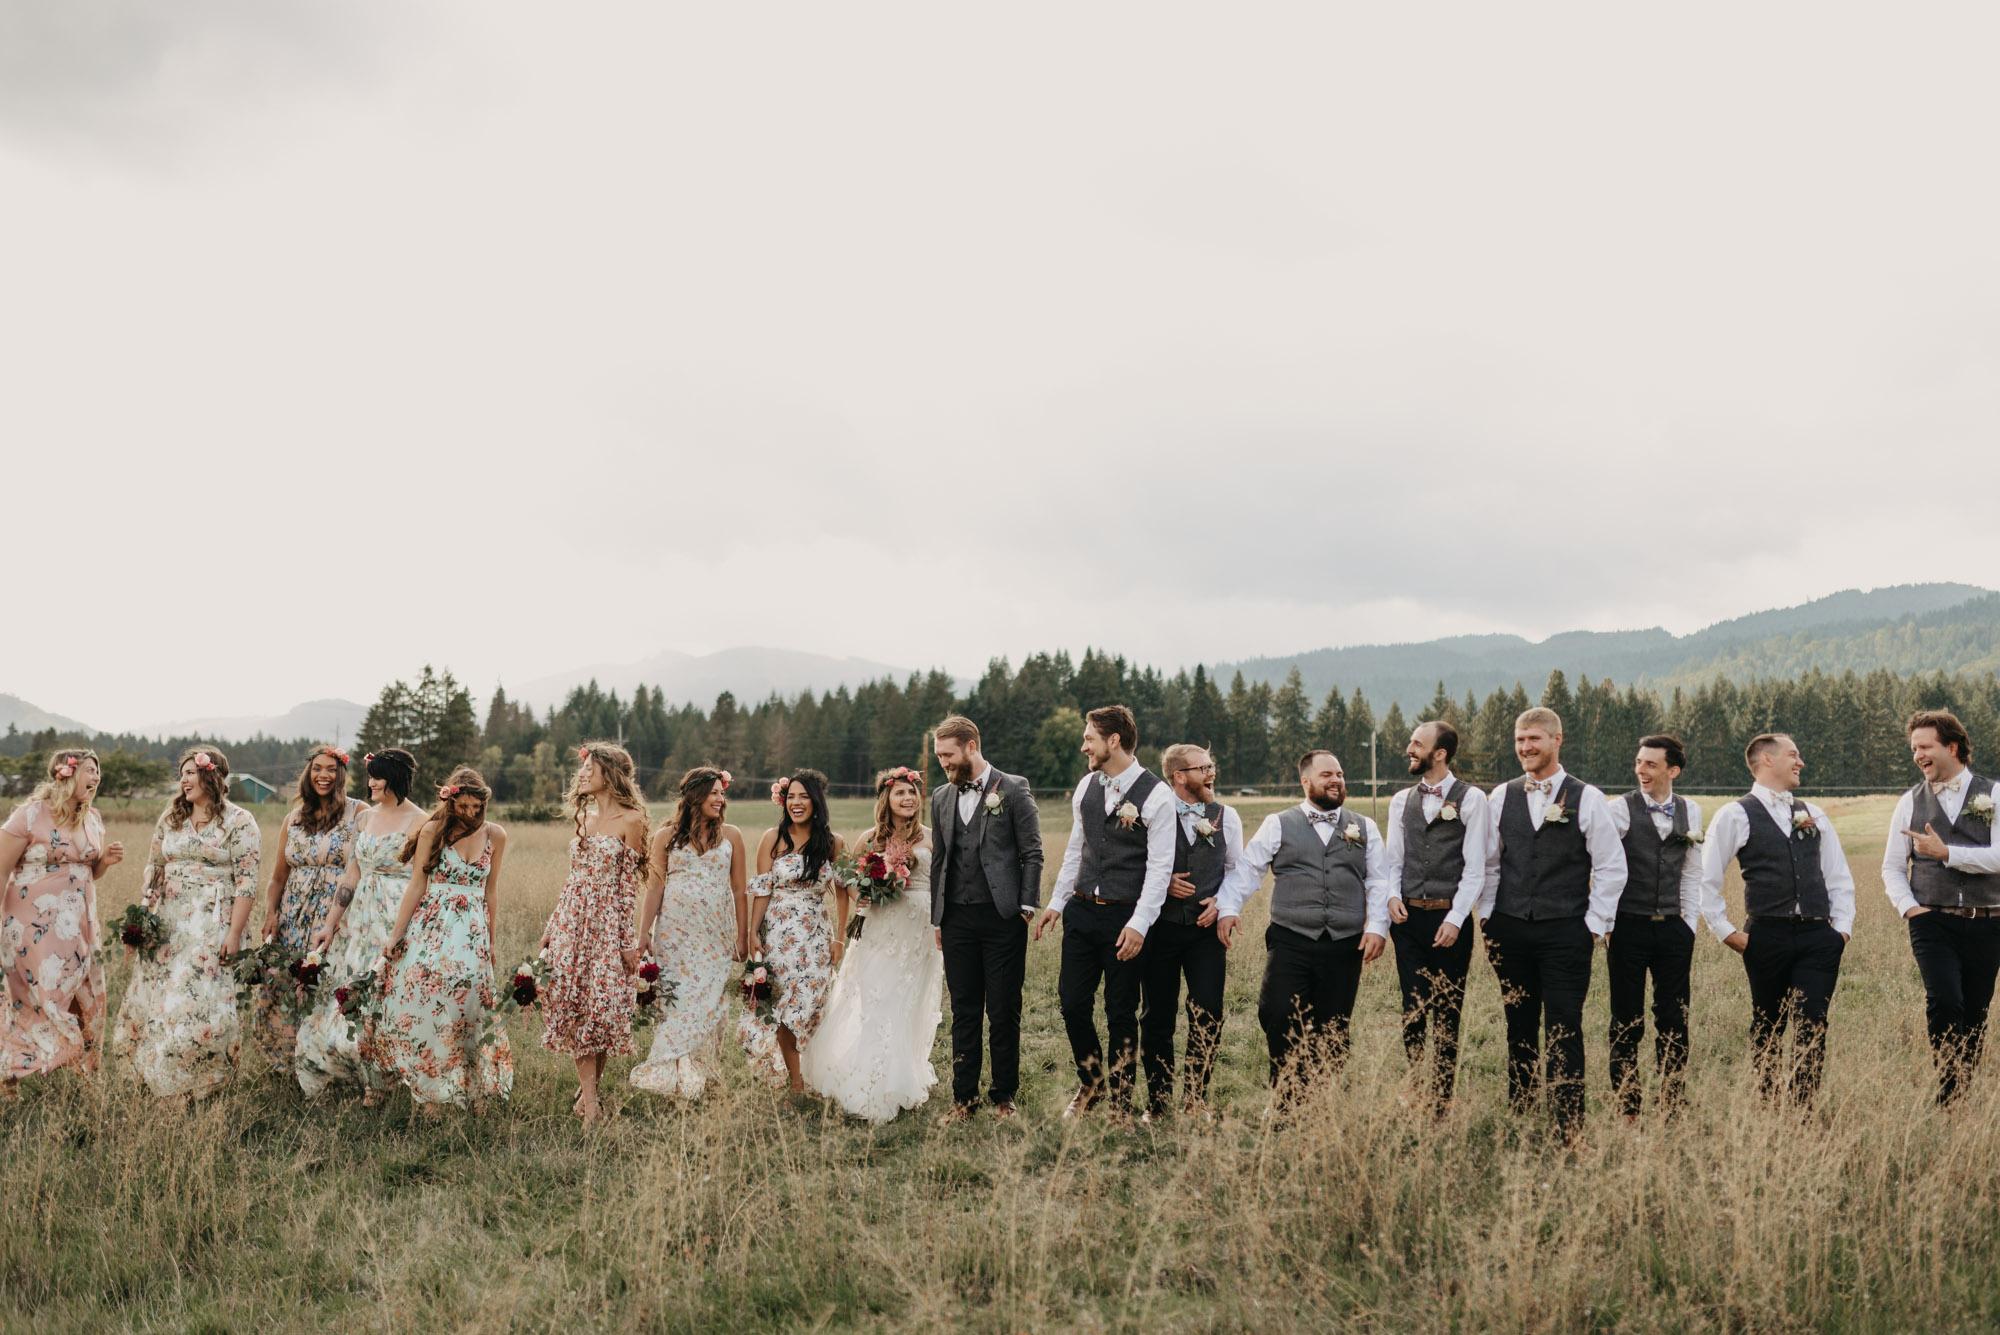 Bridal-Party-Free-People-Flower-Dresses-Washington-Wedding-8632.jpg